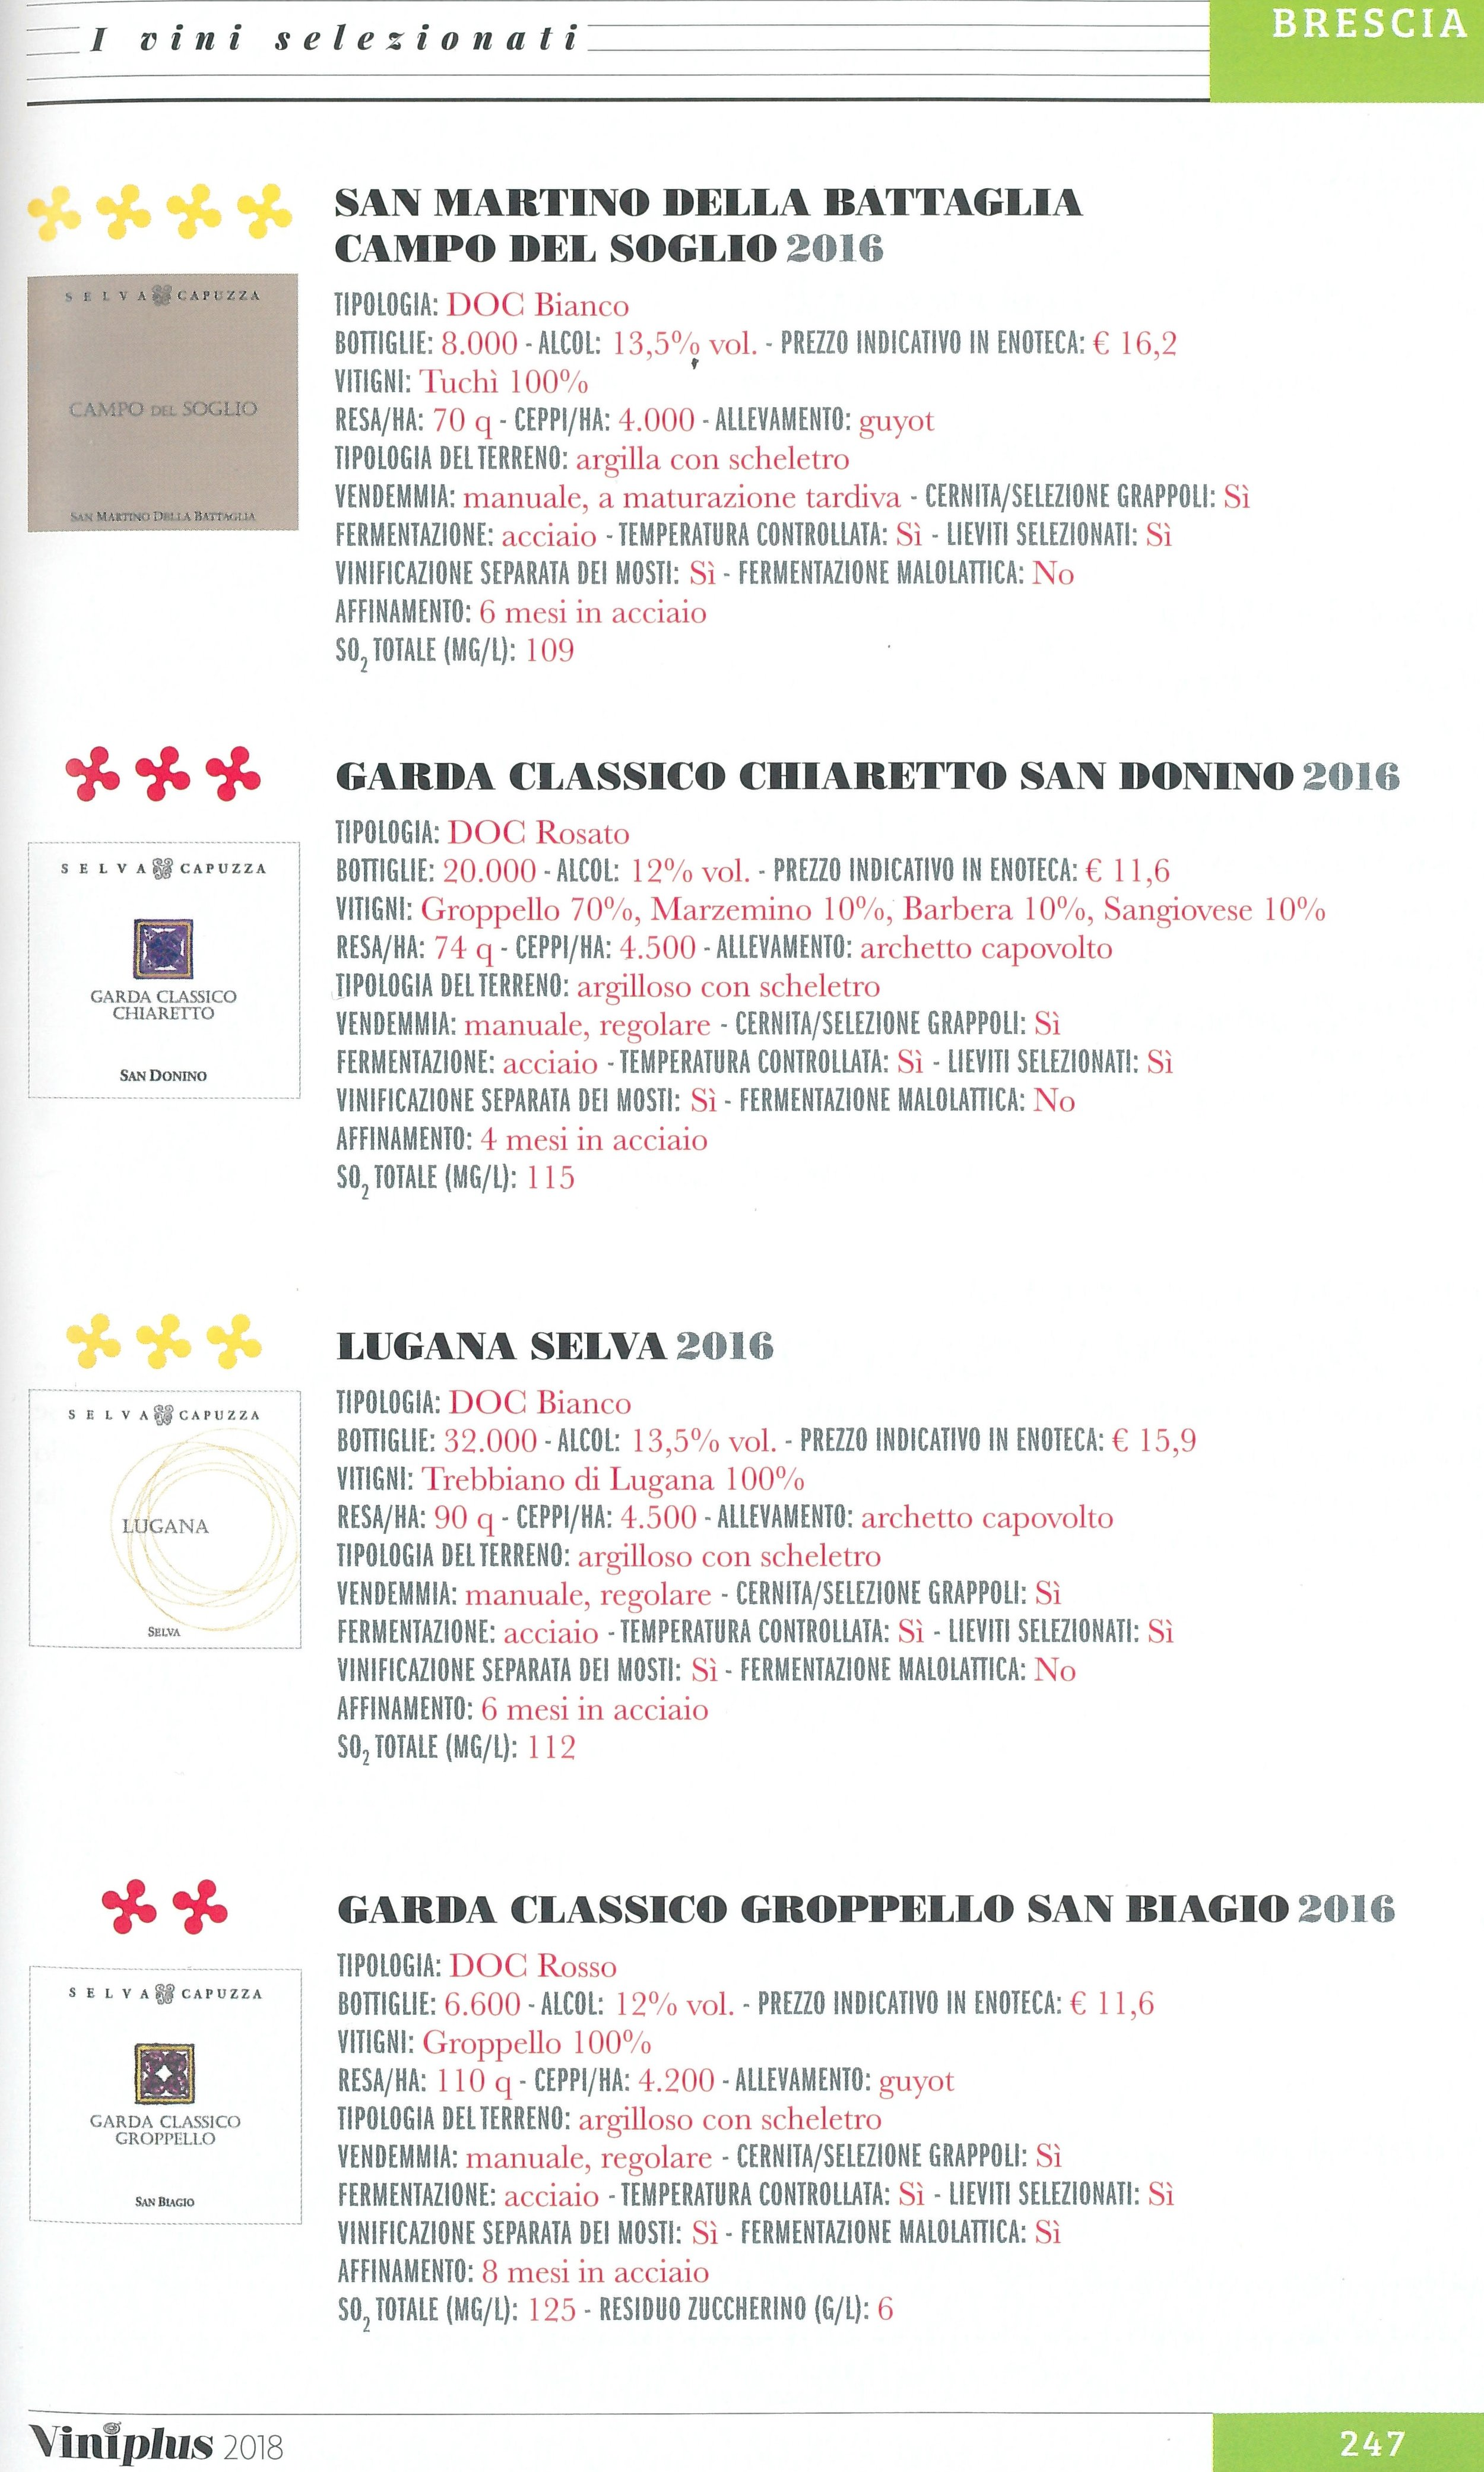 Viniplus Ais Lombardia_2018_pag 247.jpg